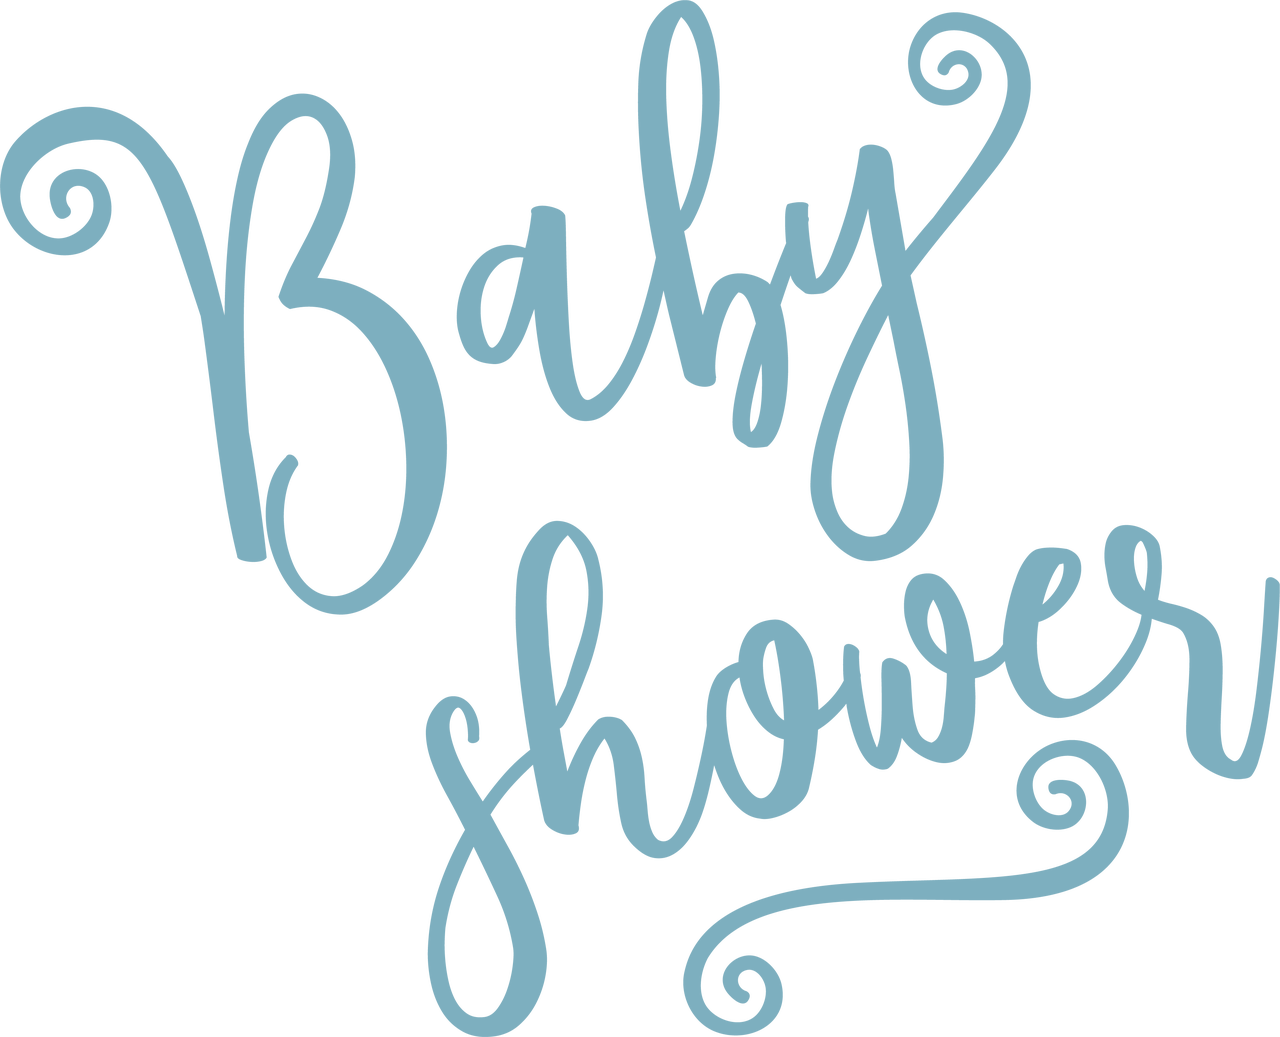 Baby Shower SVG Cut File